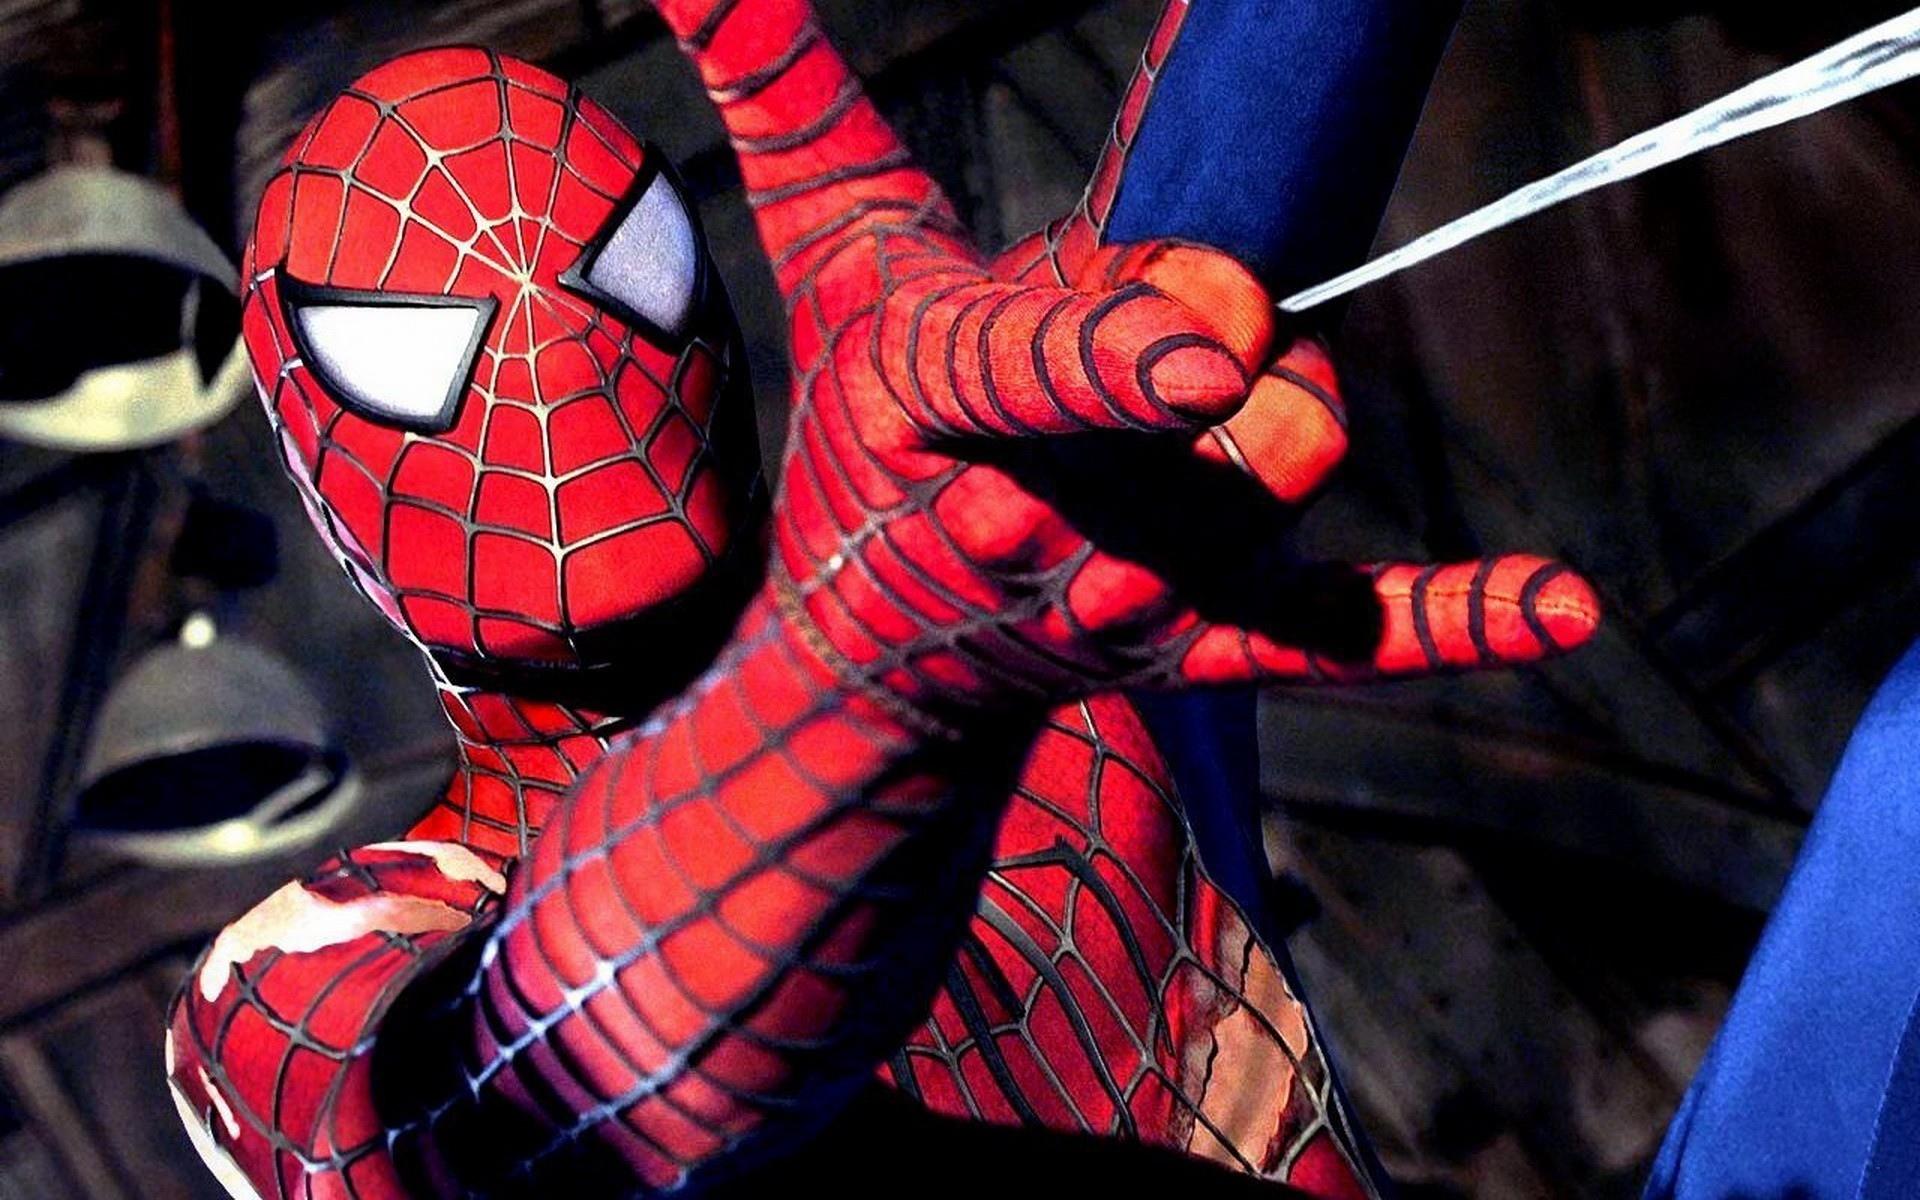 Fondos de pantalla de spiderman wallpapers - Images de spiderman ...